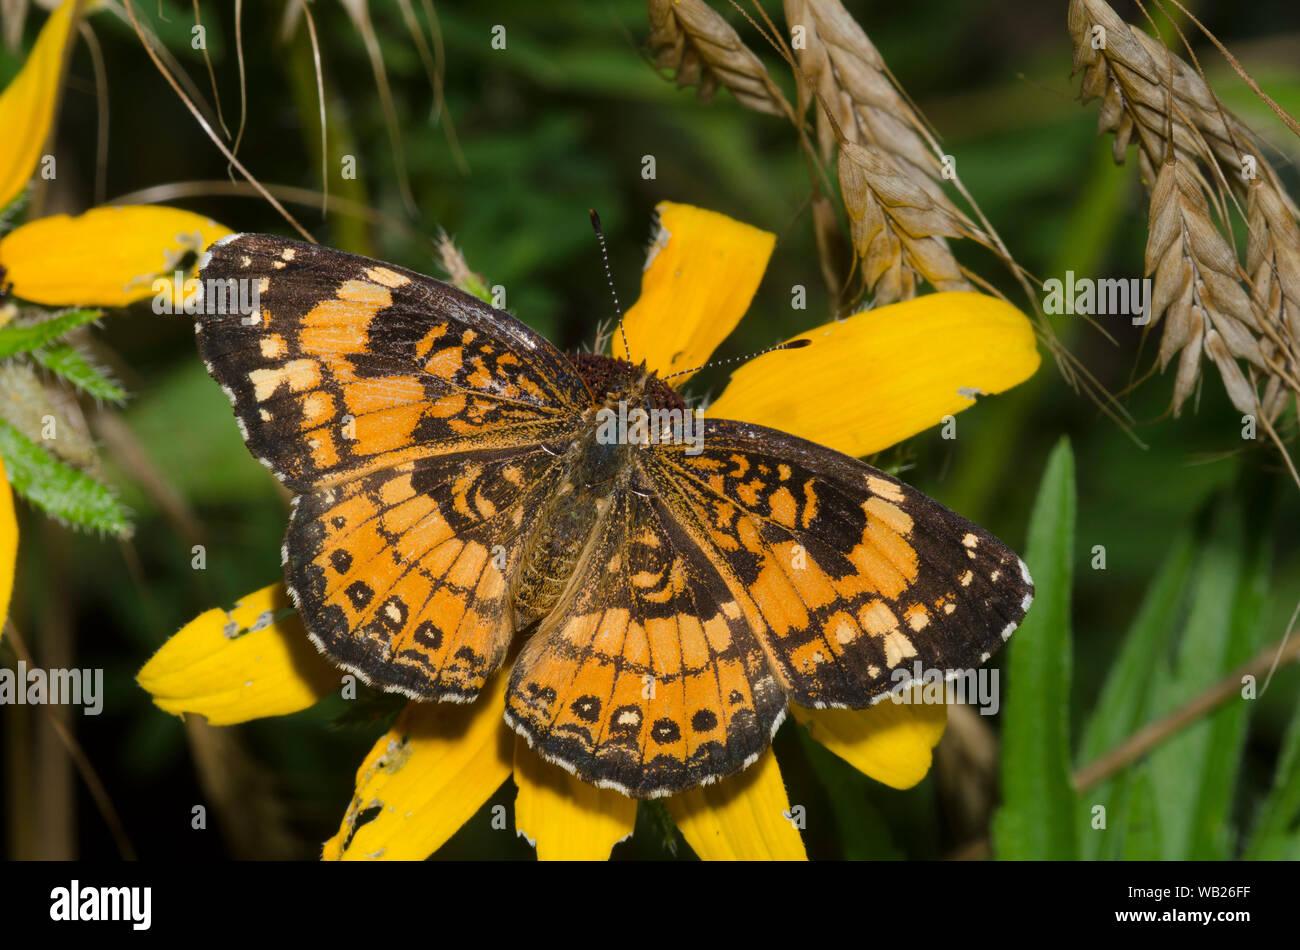 Plateado, Chlosyne Checkerspot nectaring nycteis, sobre black-eyed Susan, Rudbeckia hirta Foto de stock